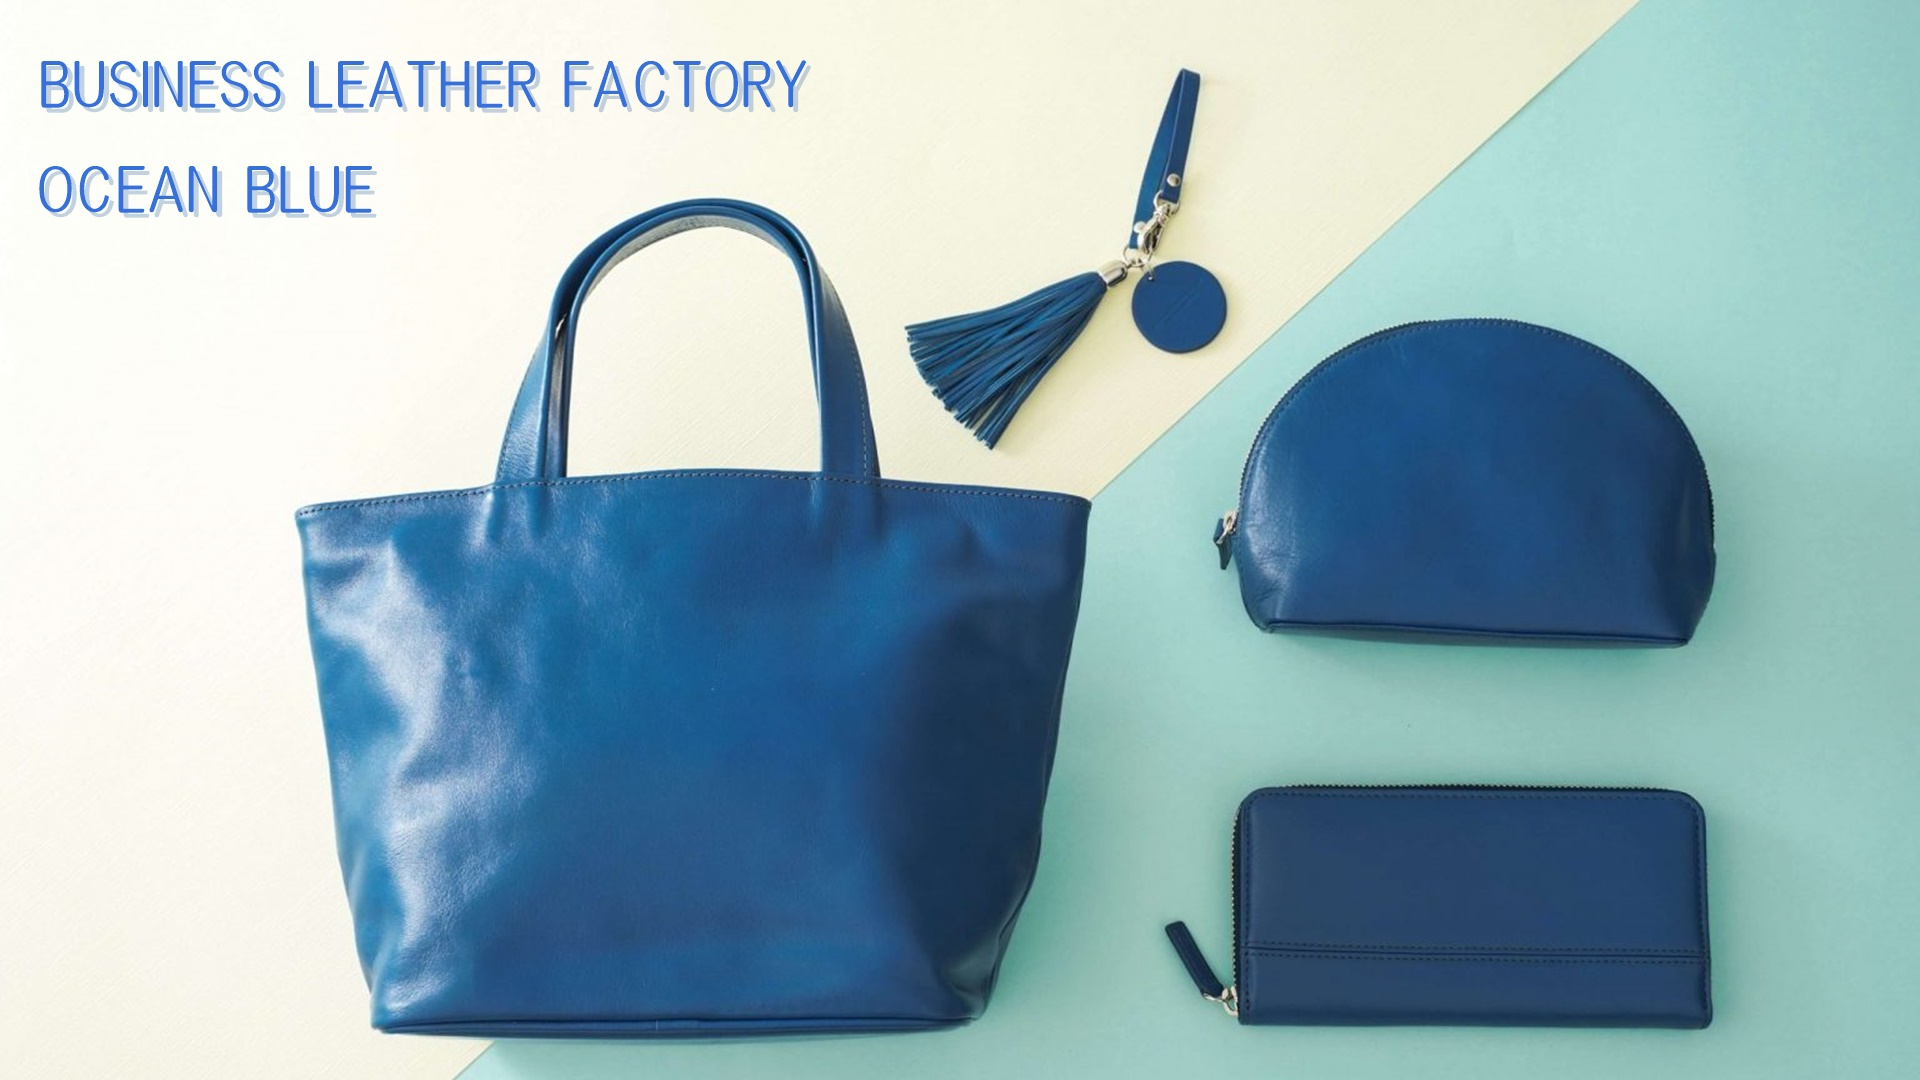 business leather factoryオーシャンブルー